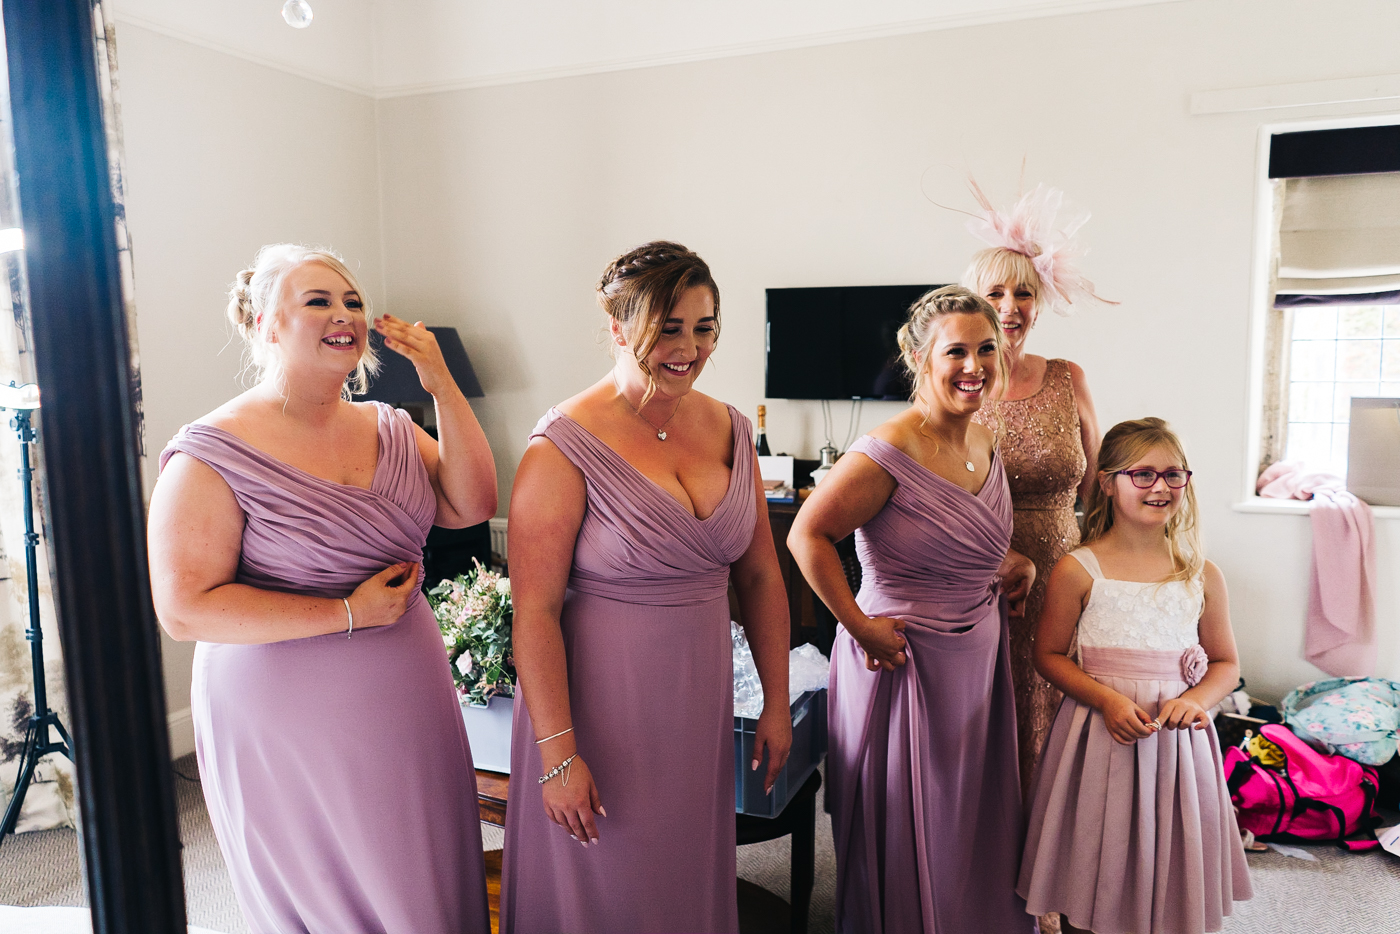 headlame-hall-north-yorkshire-north-east-photographer-wedding-0012.jpg